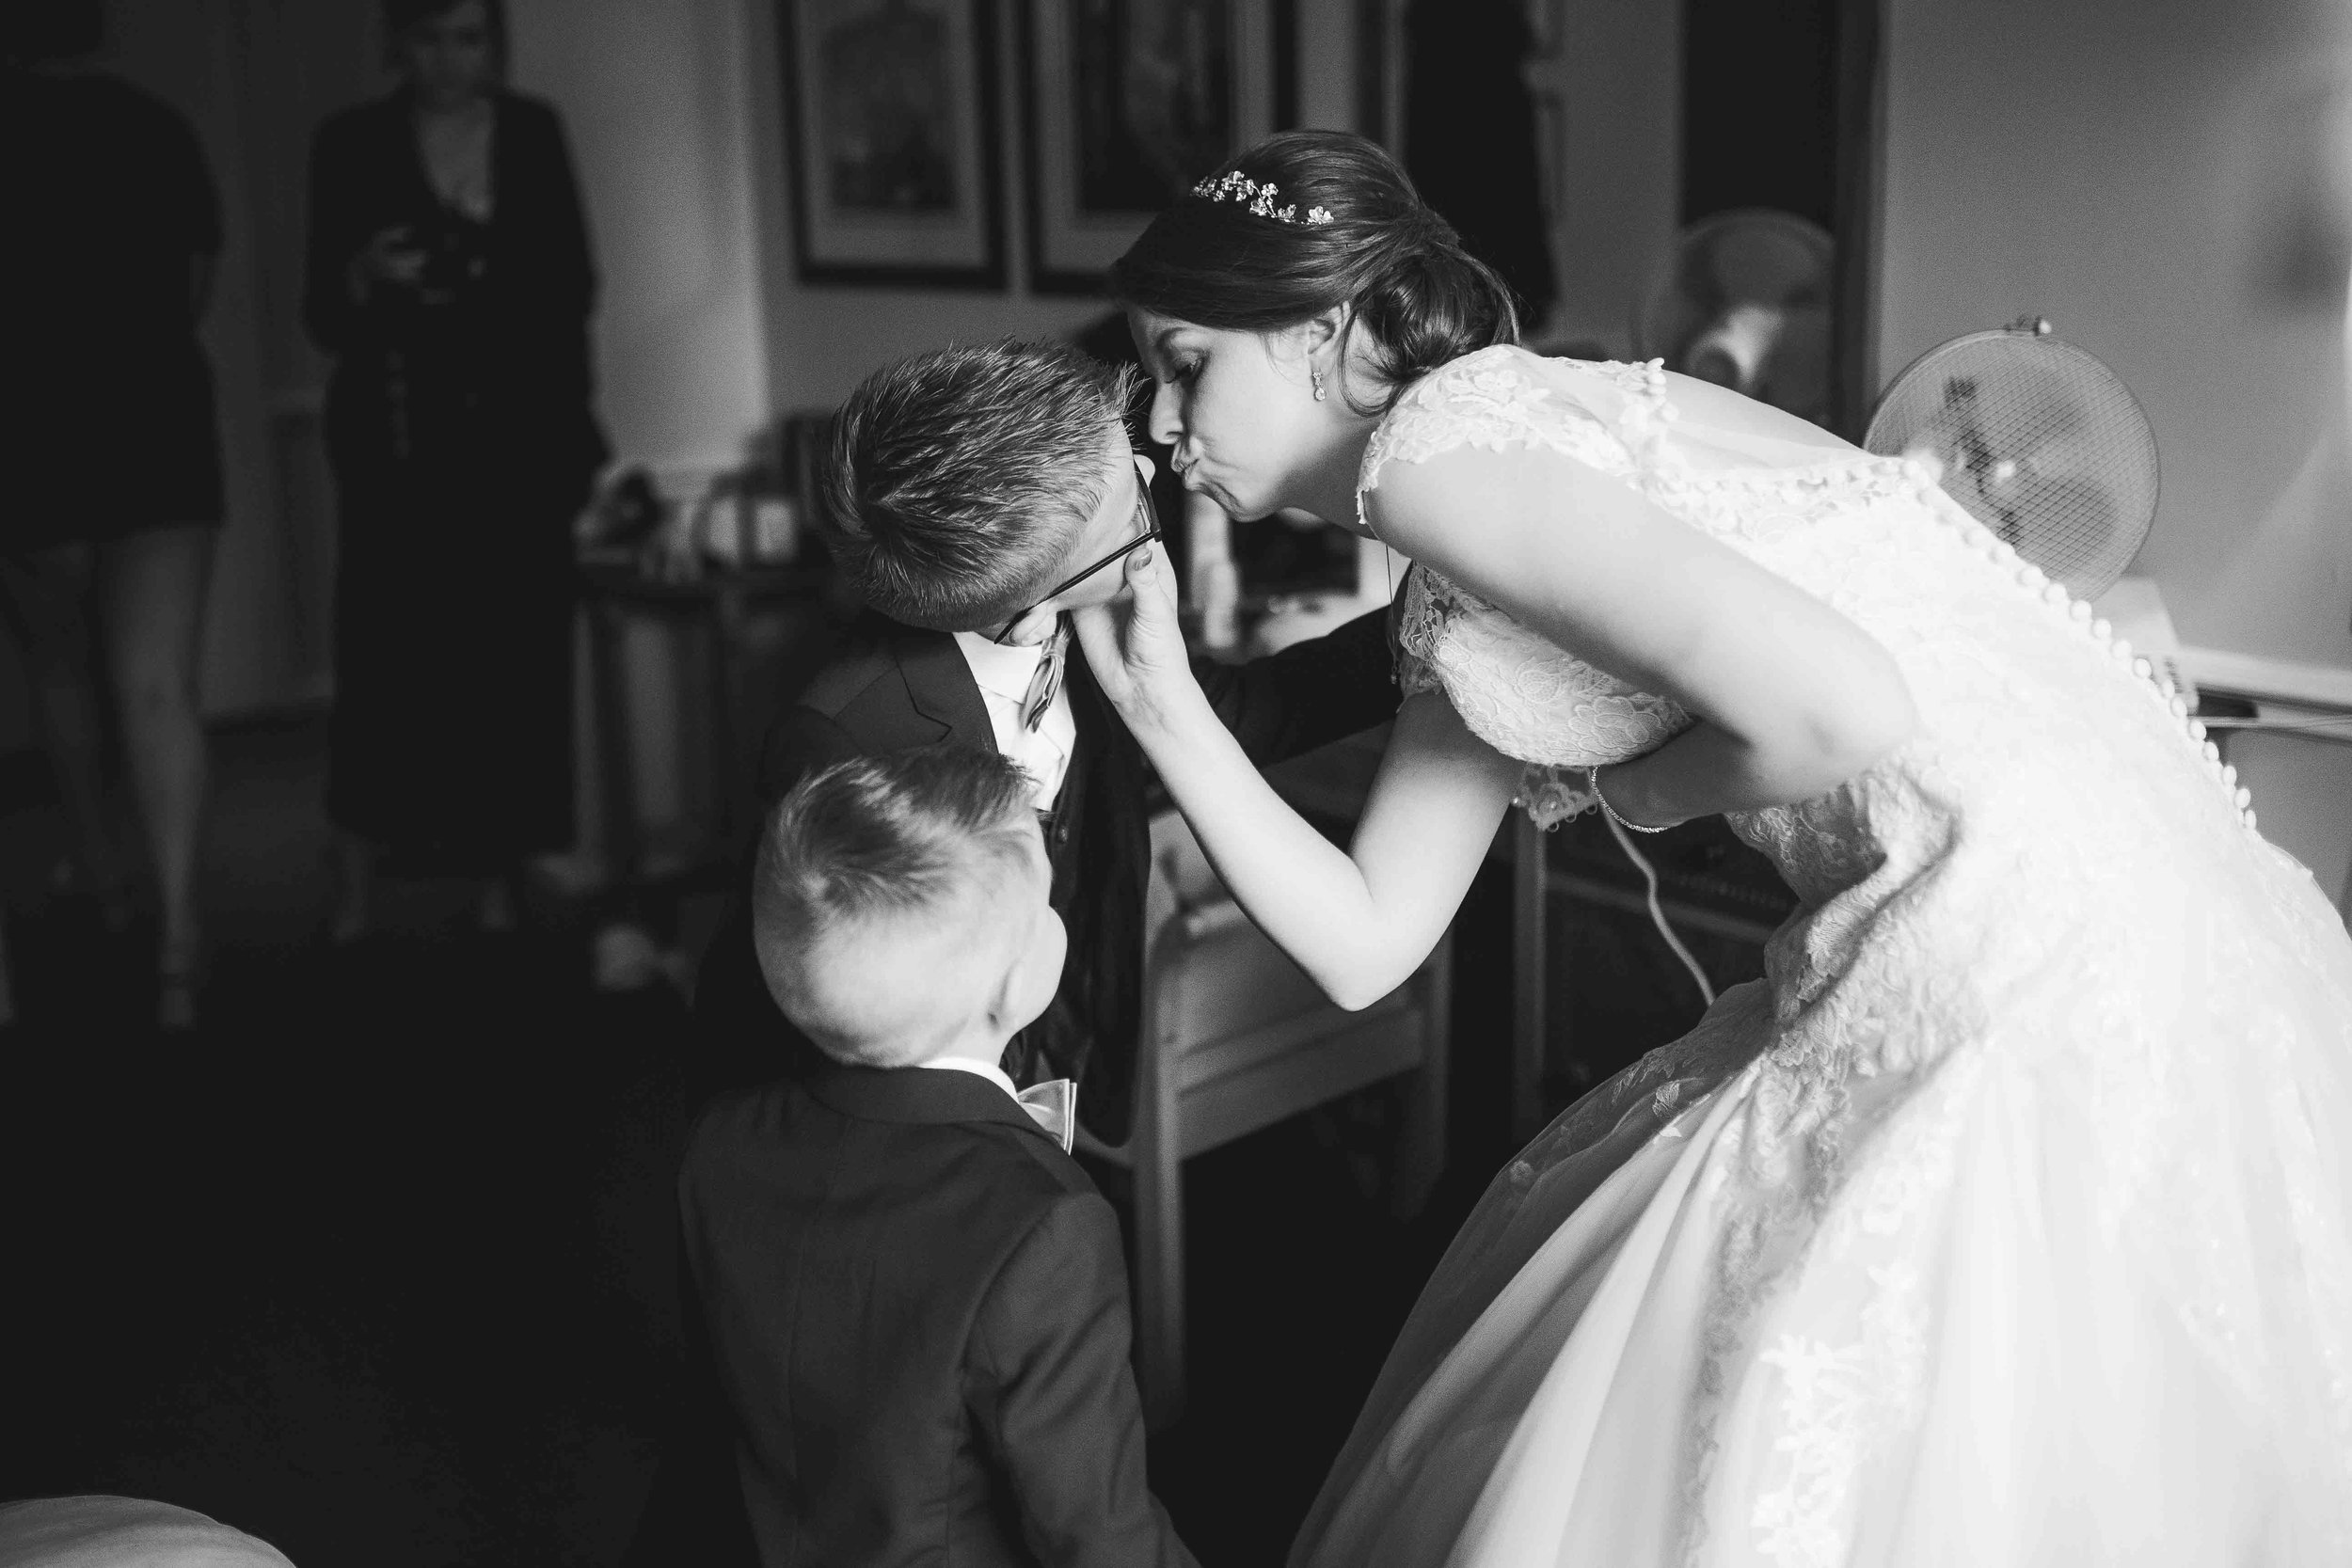 Lea-cooper-photography-willenhall-wolverhampton-wedding-photographer-birmingham-shirley-west-midlands-ceremony-church-6.JPG